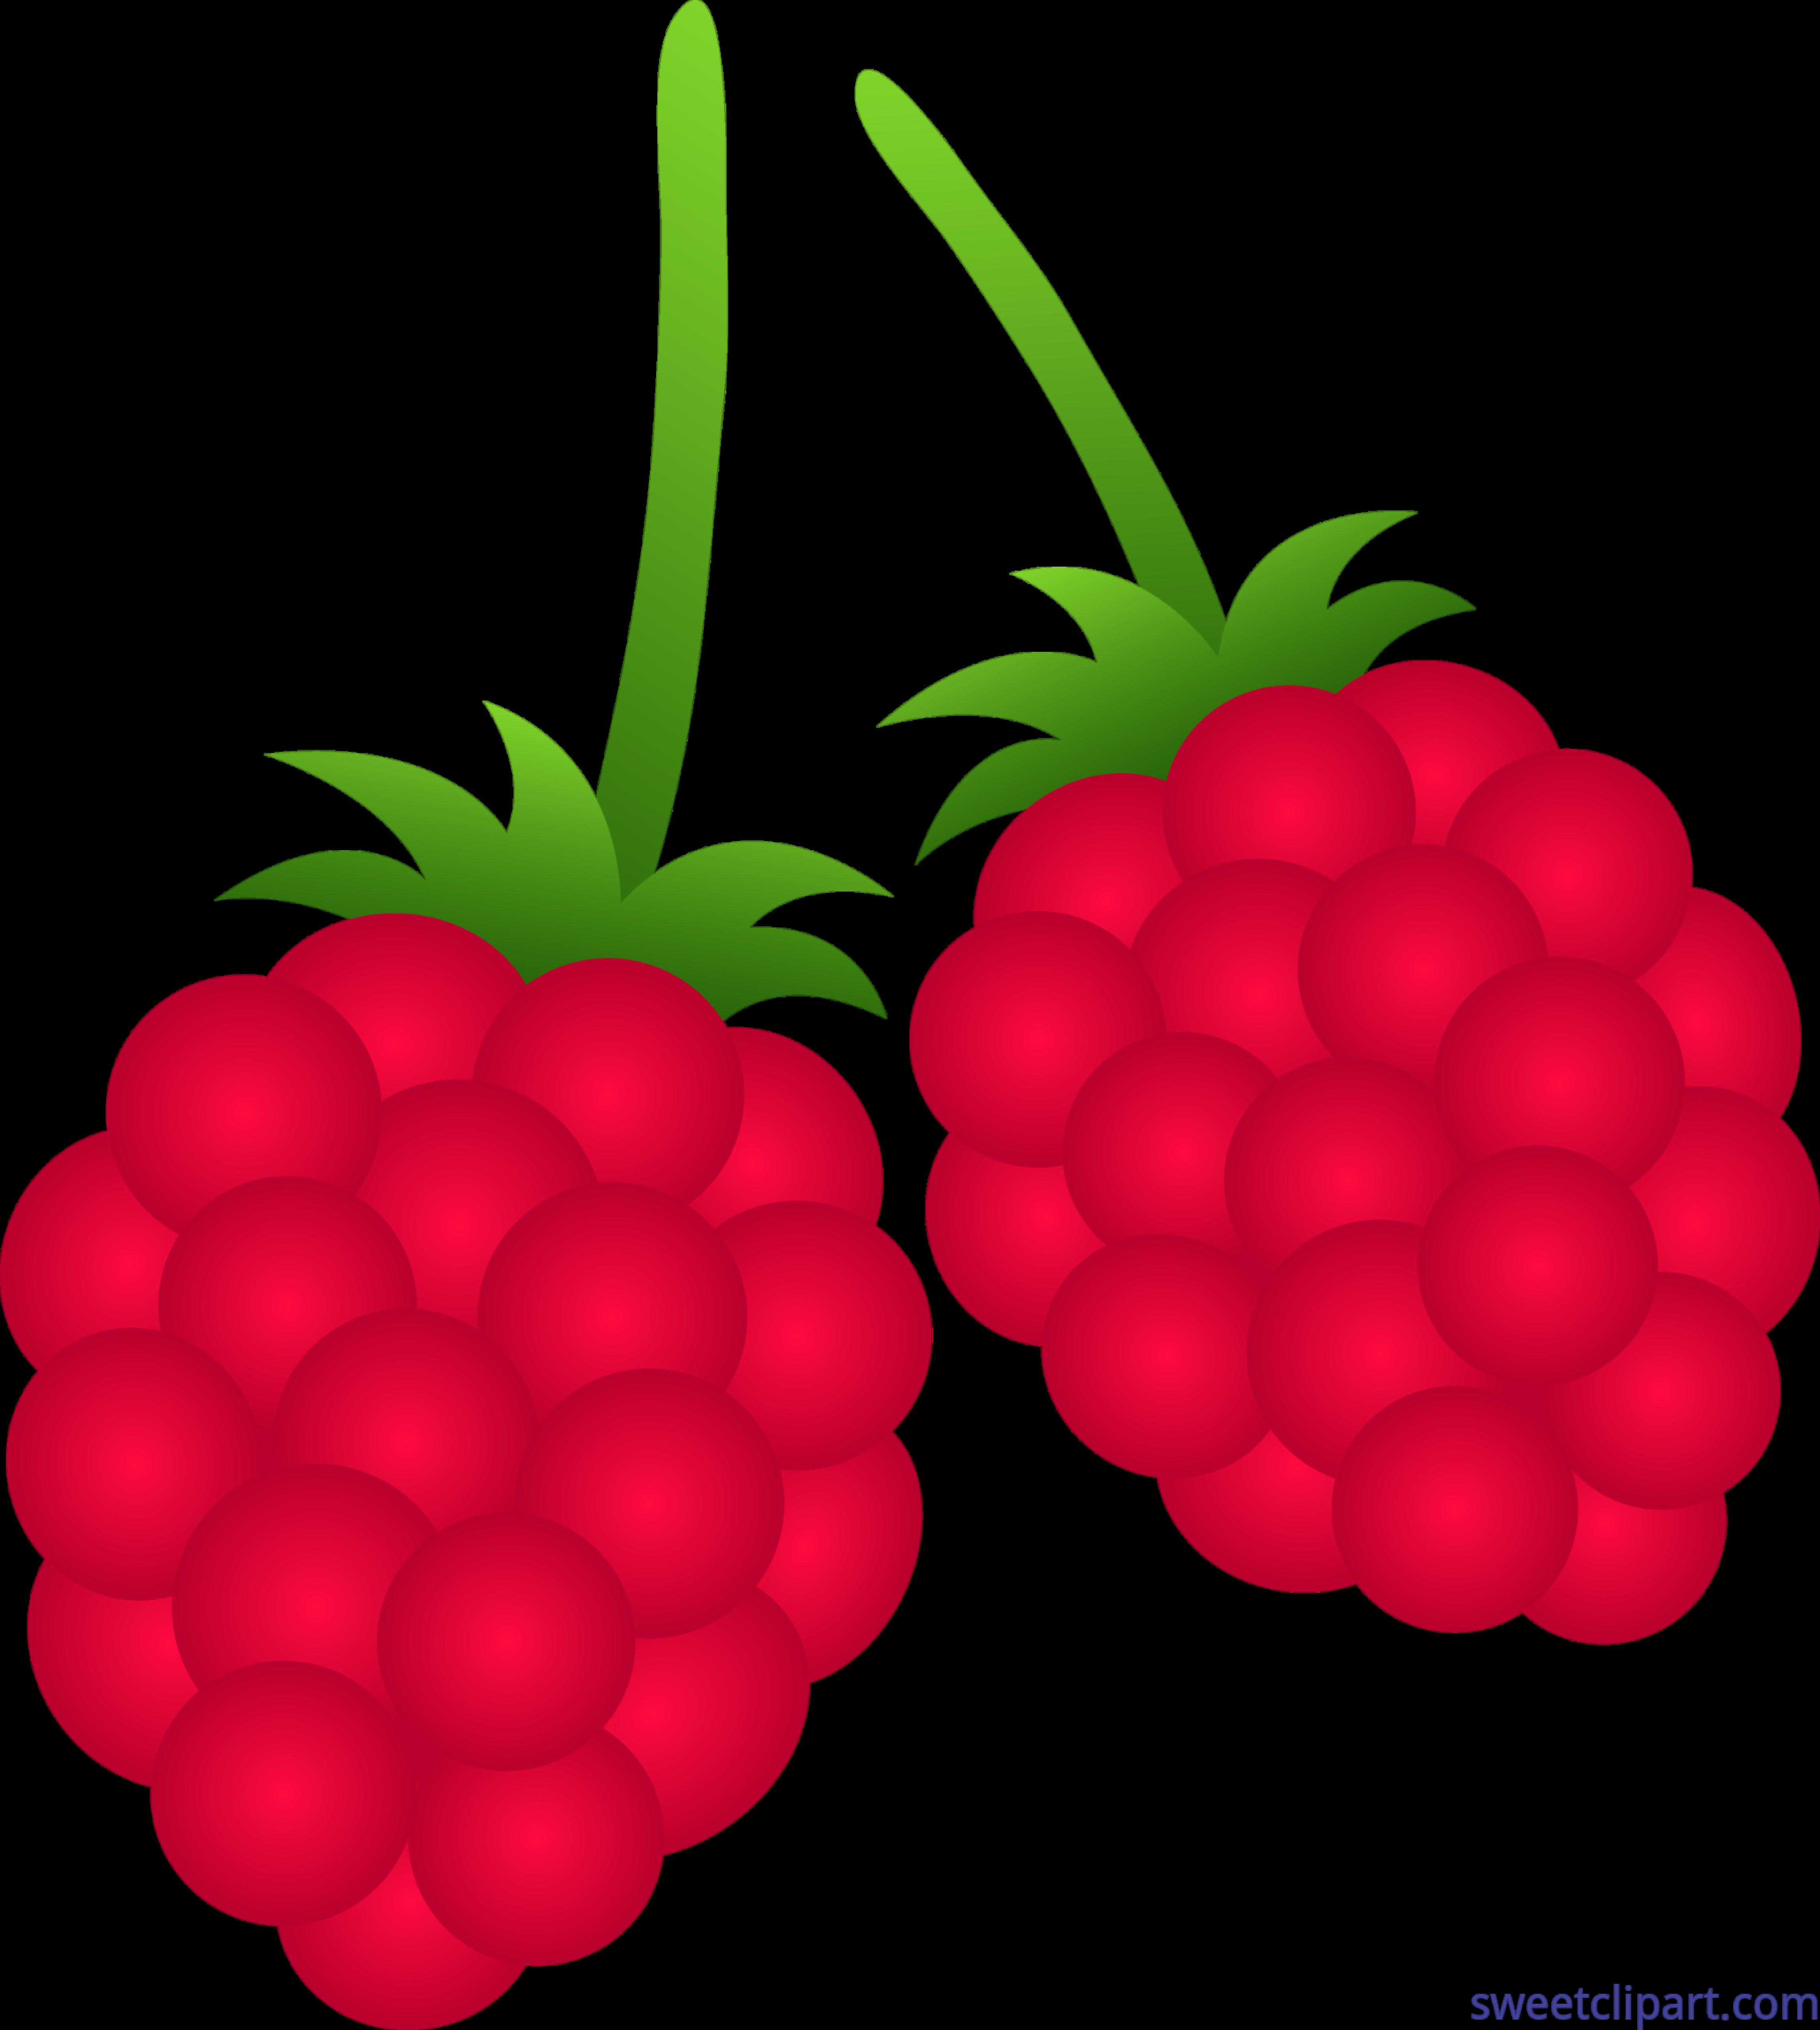 raspberries clip art sweet clip art rh m sweetclipart com strawberry clip art download strawberry clip art images